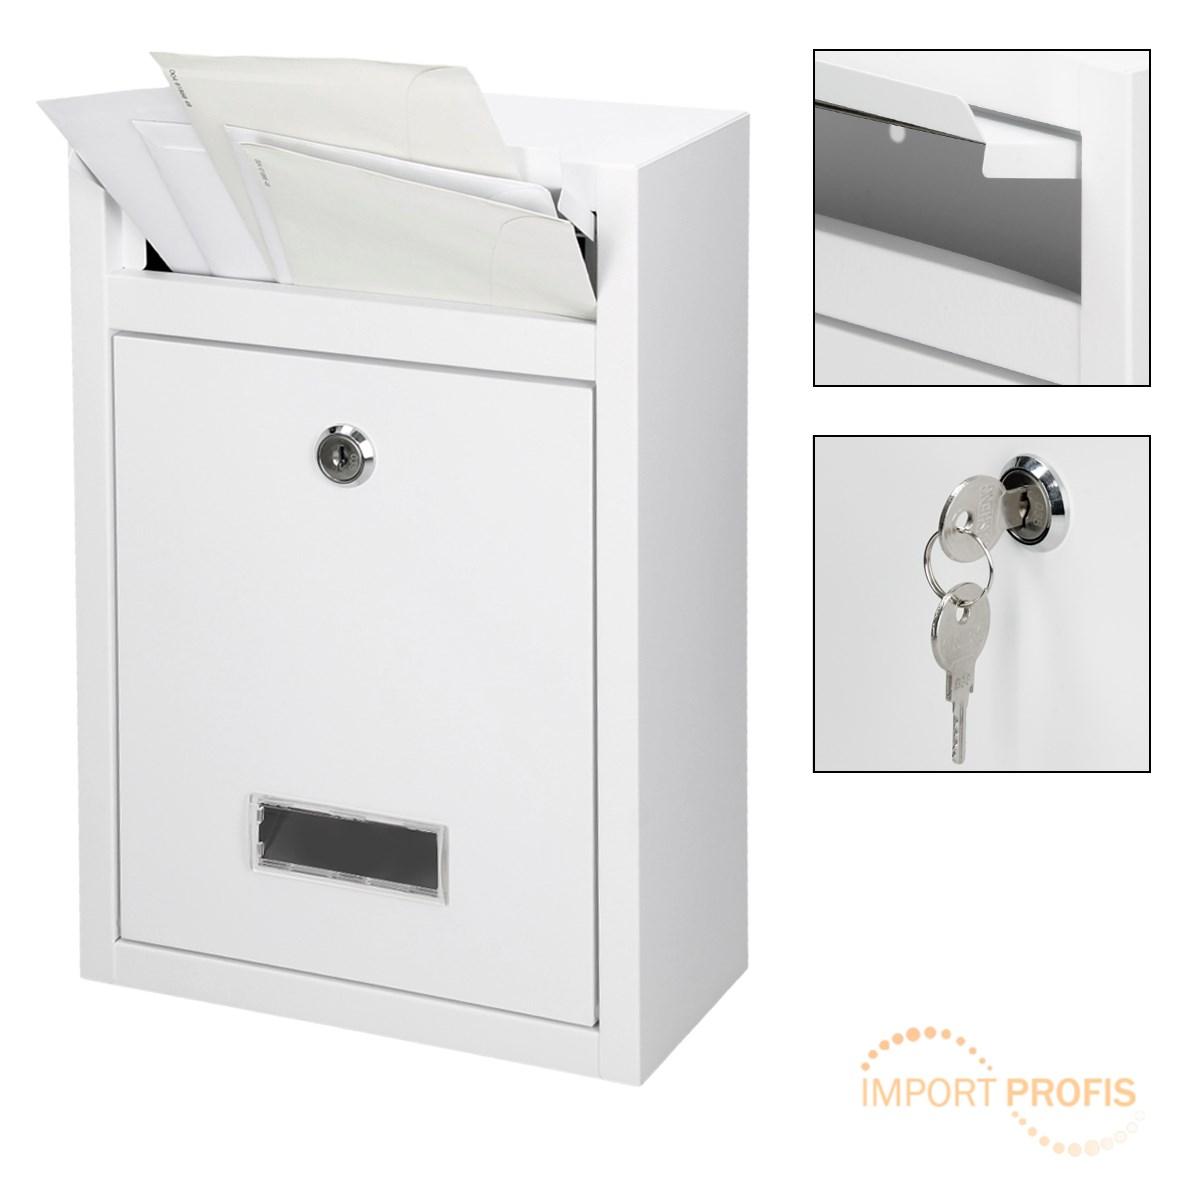 briefkasten wei postbriefkasten wandbriefkasten hausbriefkasten postkasten ebay. Black Bedroom Furniture Sets. Home Design Ideas